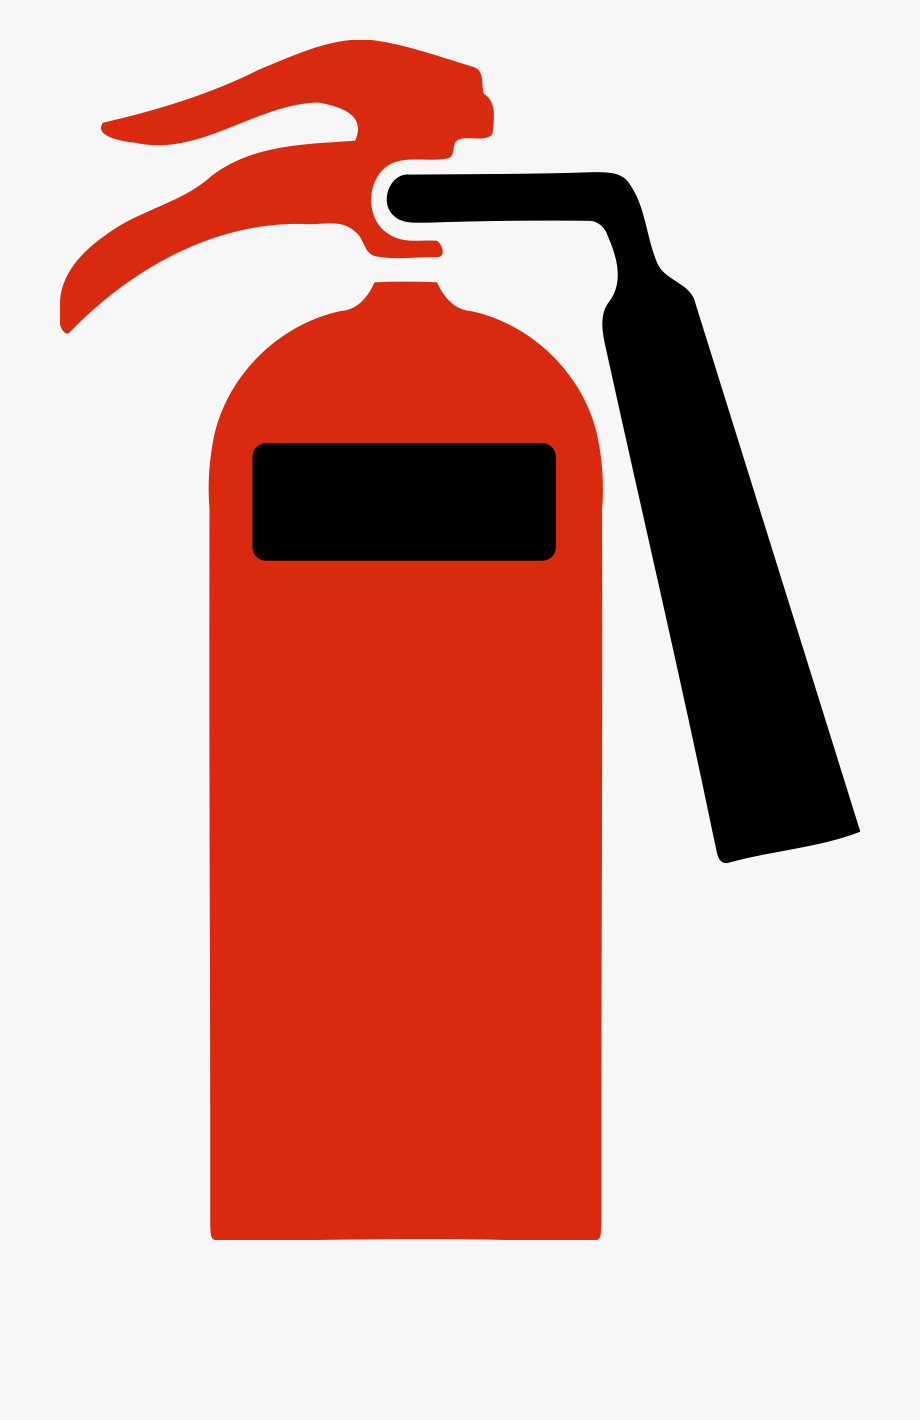 Fire extinguisher sign clipart clip art royalty free stock Extinguisher Clipart Fire Uniform - Icon Fire Extinguisher Png ... clip art royalty free stock